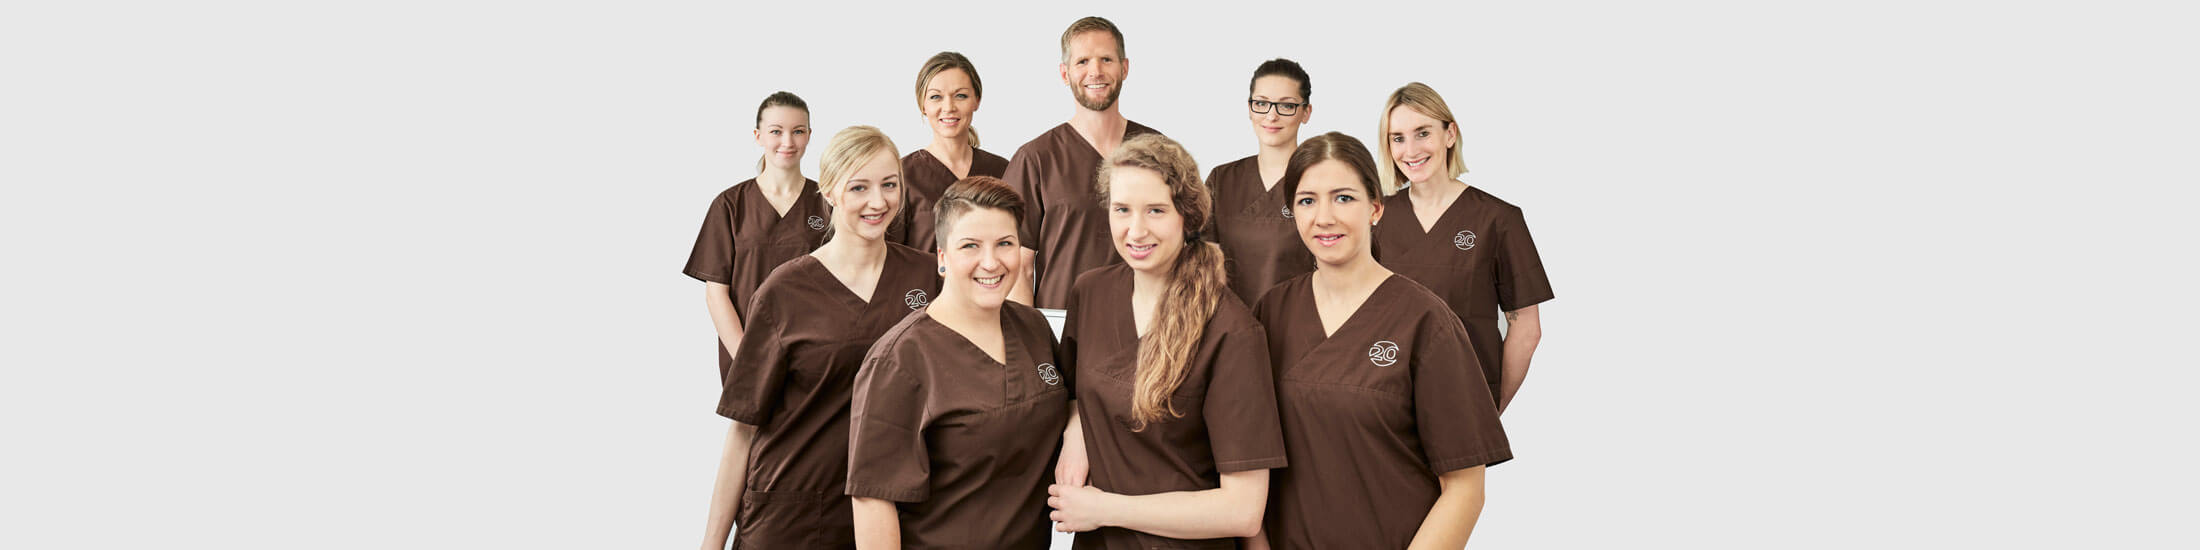 Zahnarztpraxis Dr. Kai Zwanzig Bielefeld Team